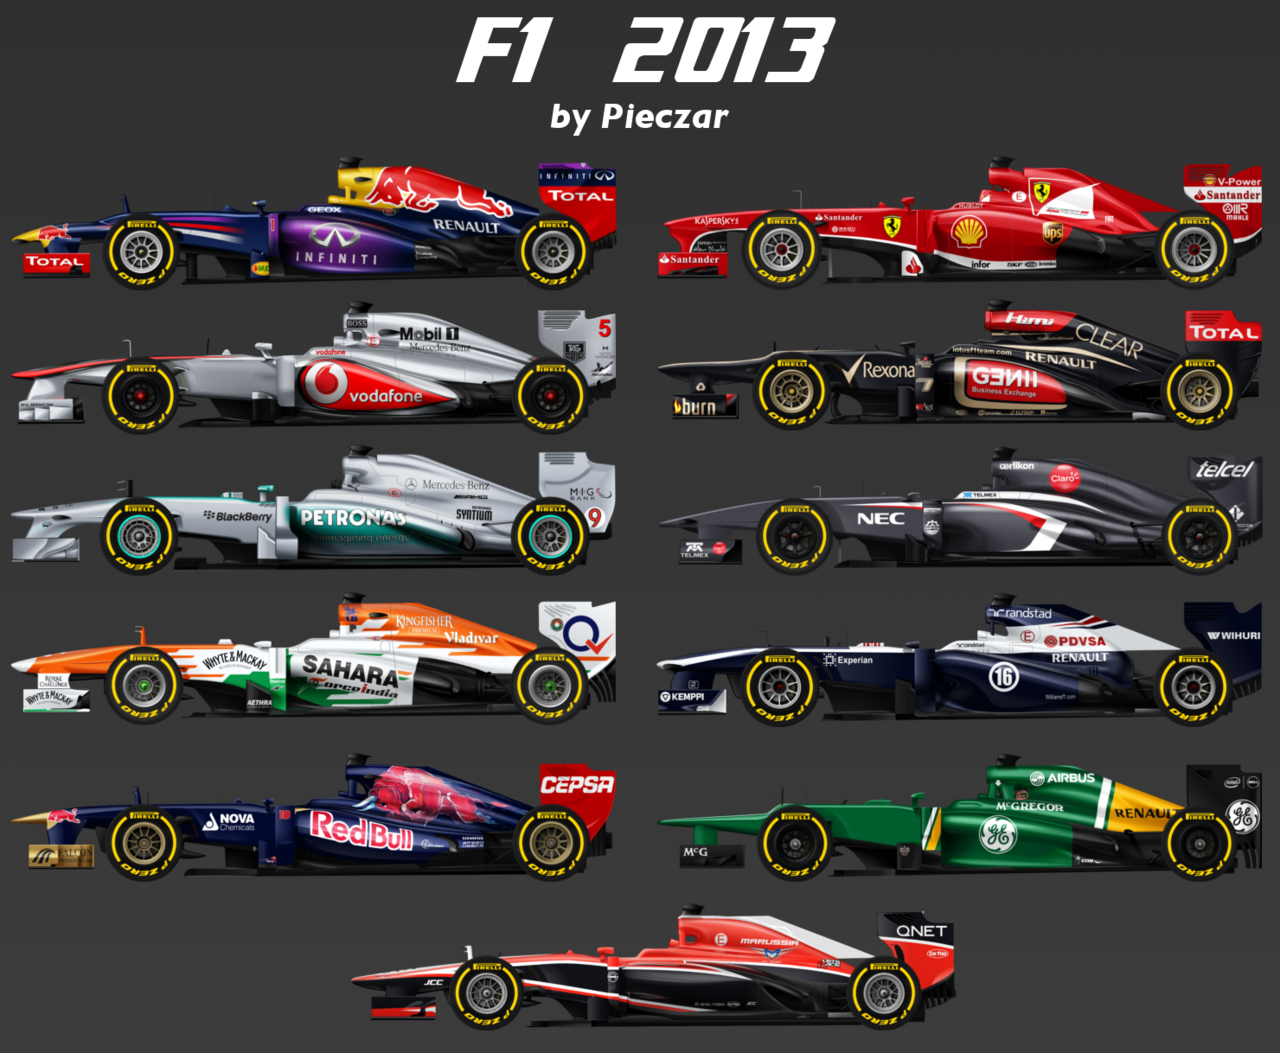 Formula 1 2013 Wallpaper HD ImageBankbiz 1280x1053